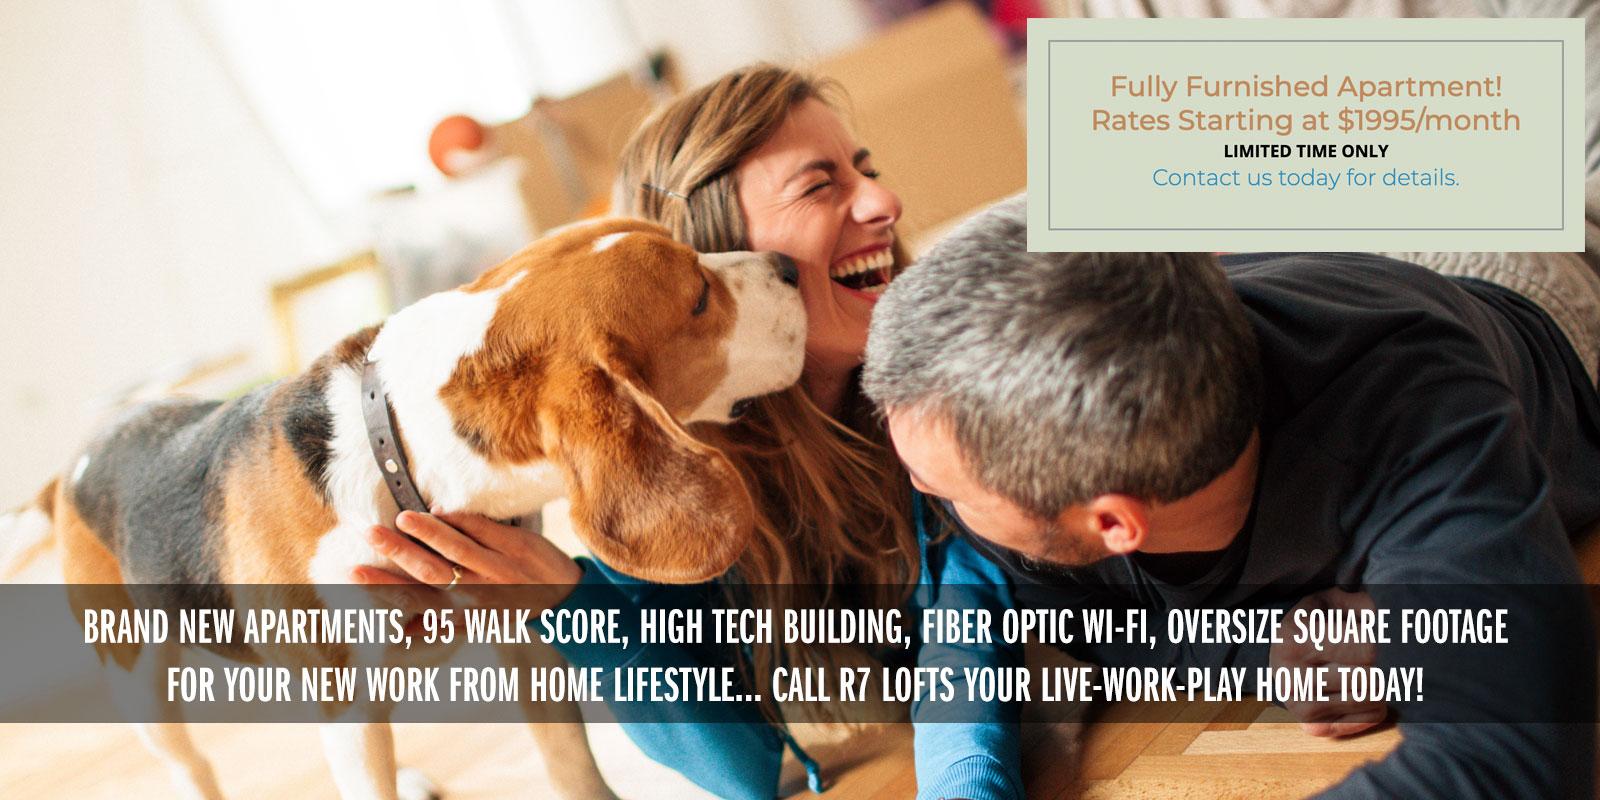 dog-friendly-apartment-stpaul-furnished-apt